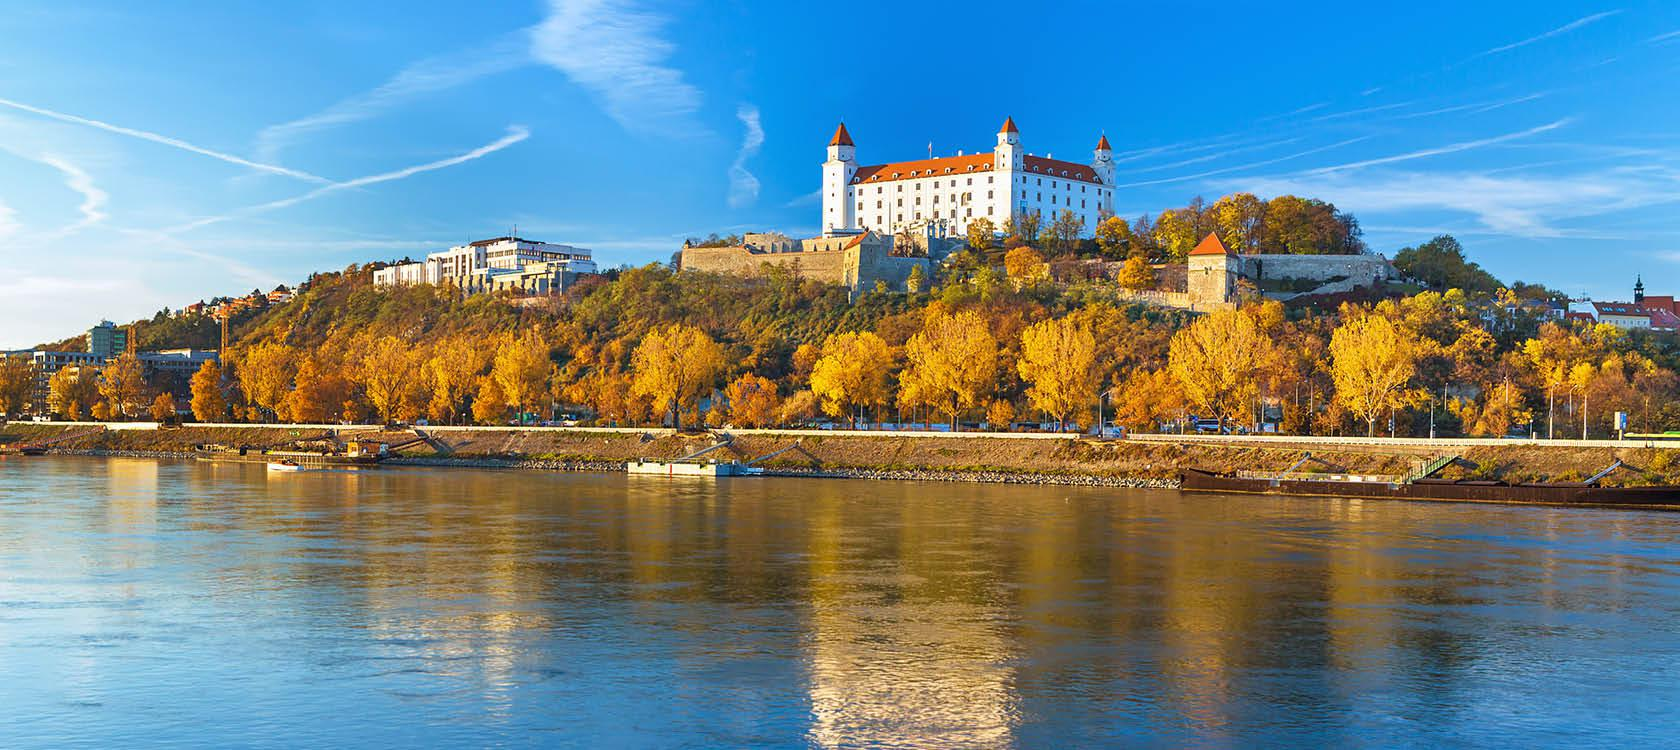 Krydstogt på Donaufloden i 2018 med Samvirke